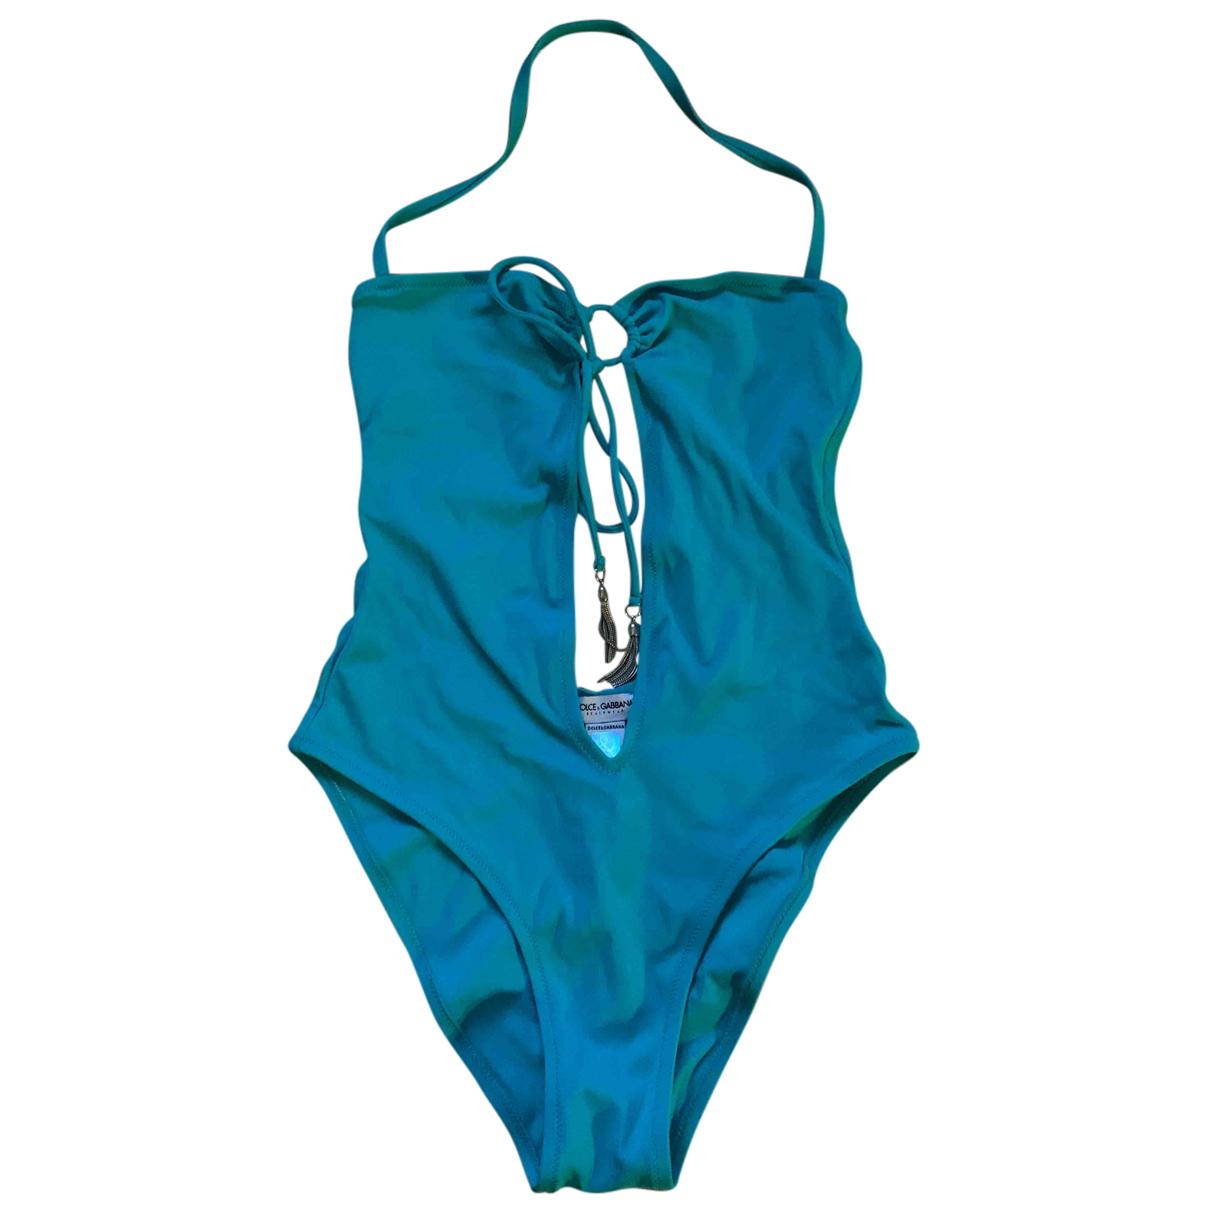 Dolce & Gabbana N Turquoise Swimwear for Women S International